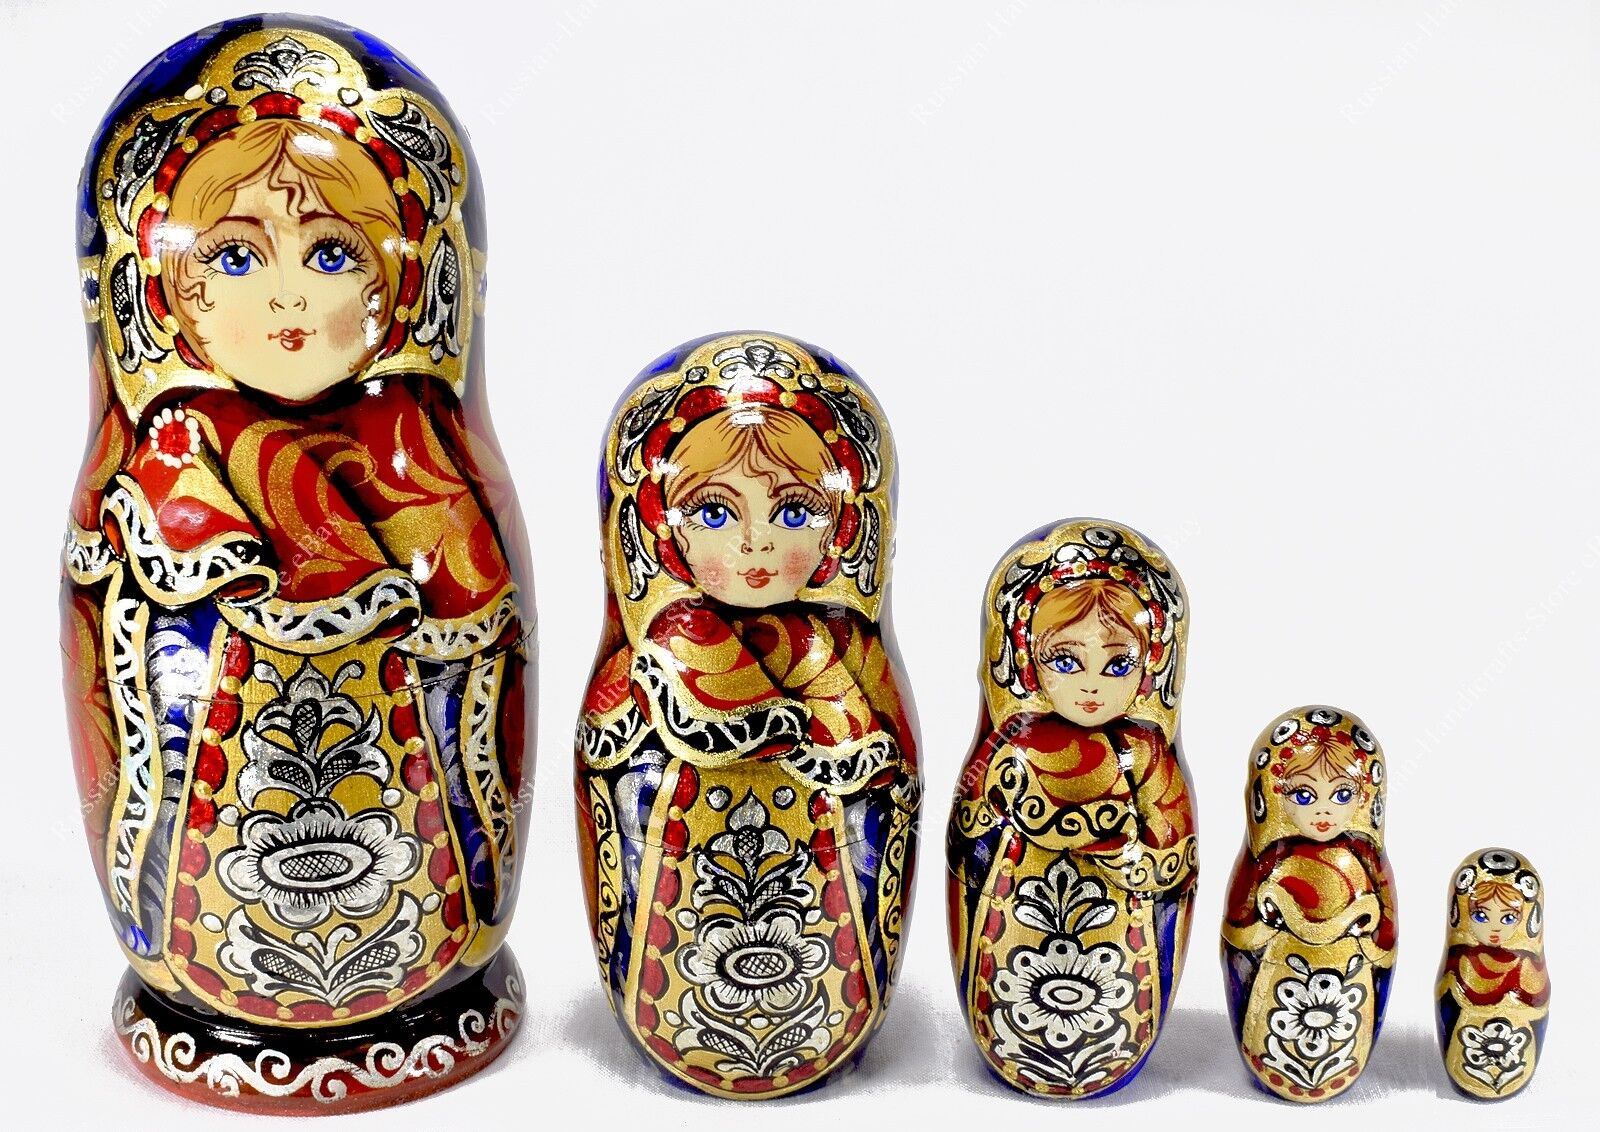 6  AUTHOR'S GORGEOUS AUTHENTIC RUSSIAN TRADITIONAL MATRYOSHKA NESTING DOLLS 5PCS